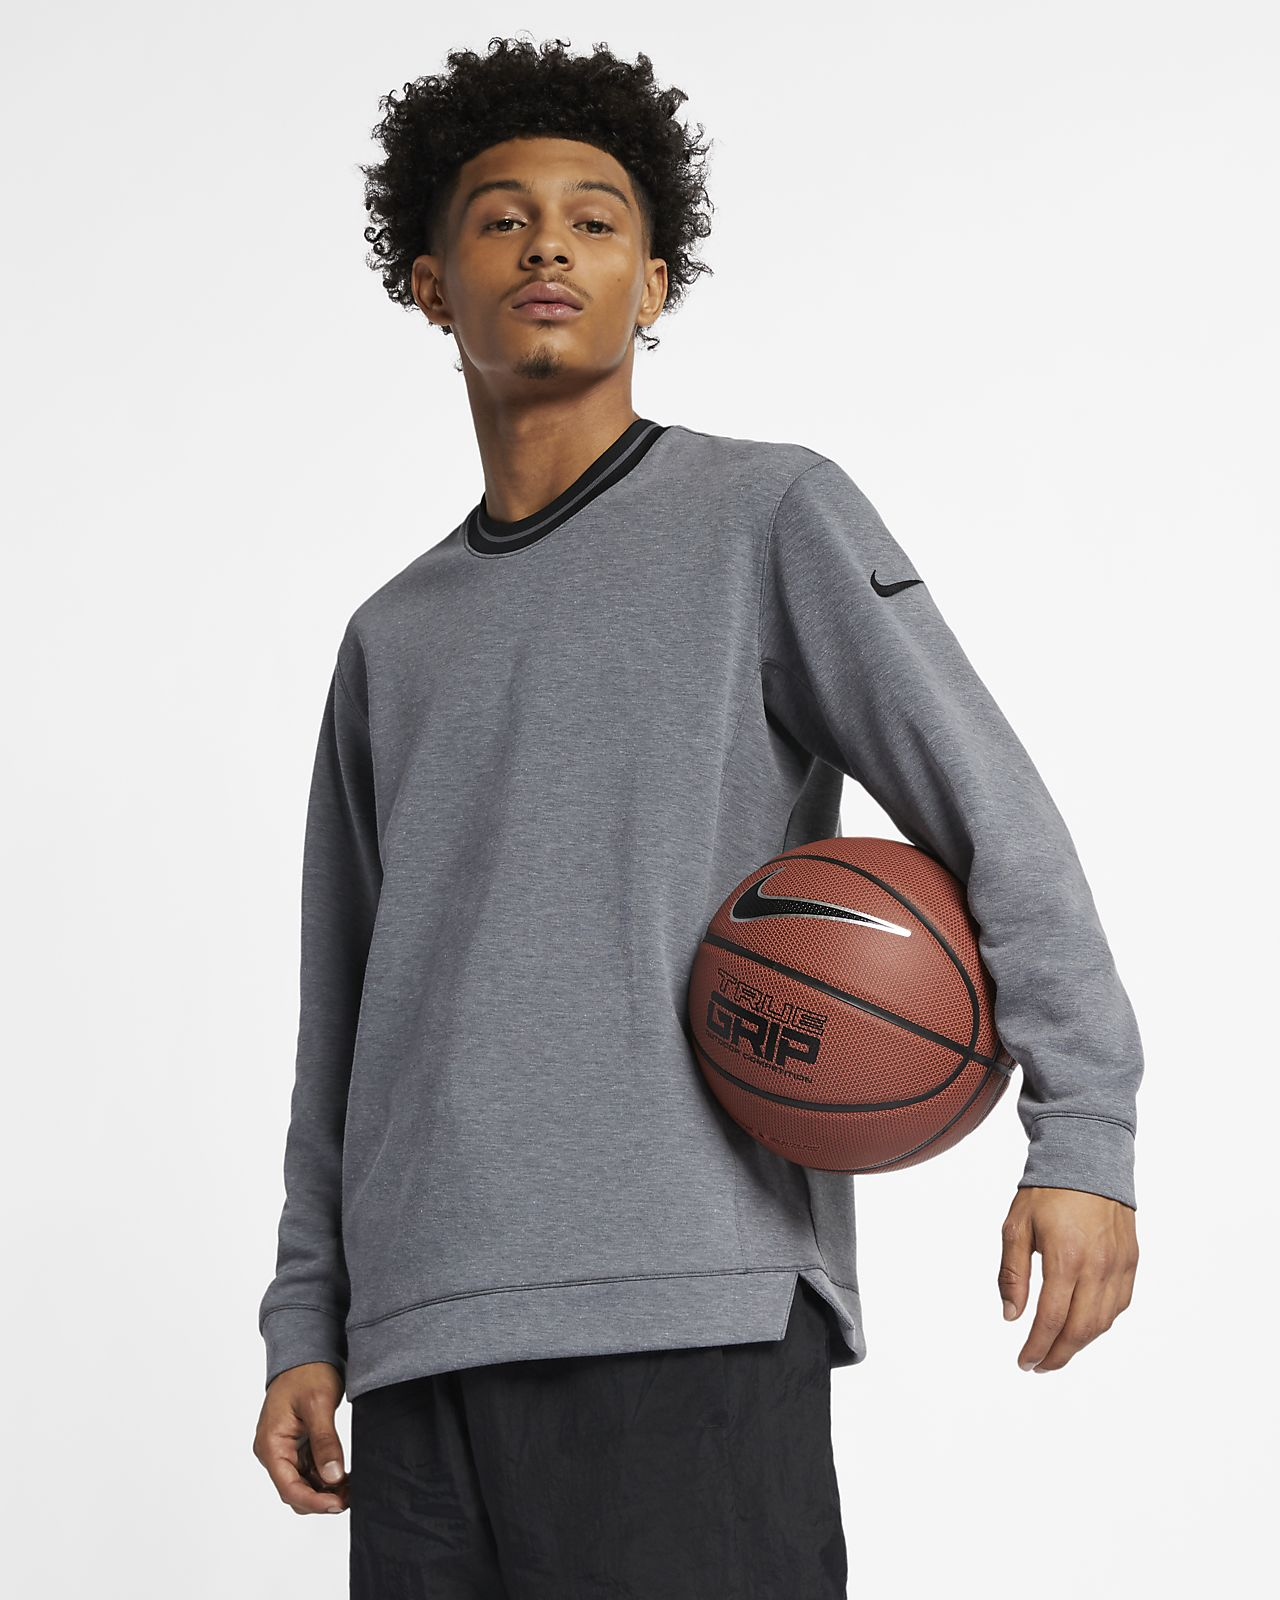 4521f1ff Nike Dri-FIT Men's Long-Sleeve Basketball Top. Nike.com AU